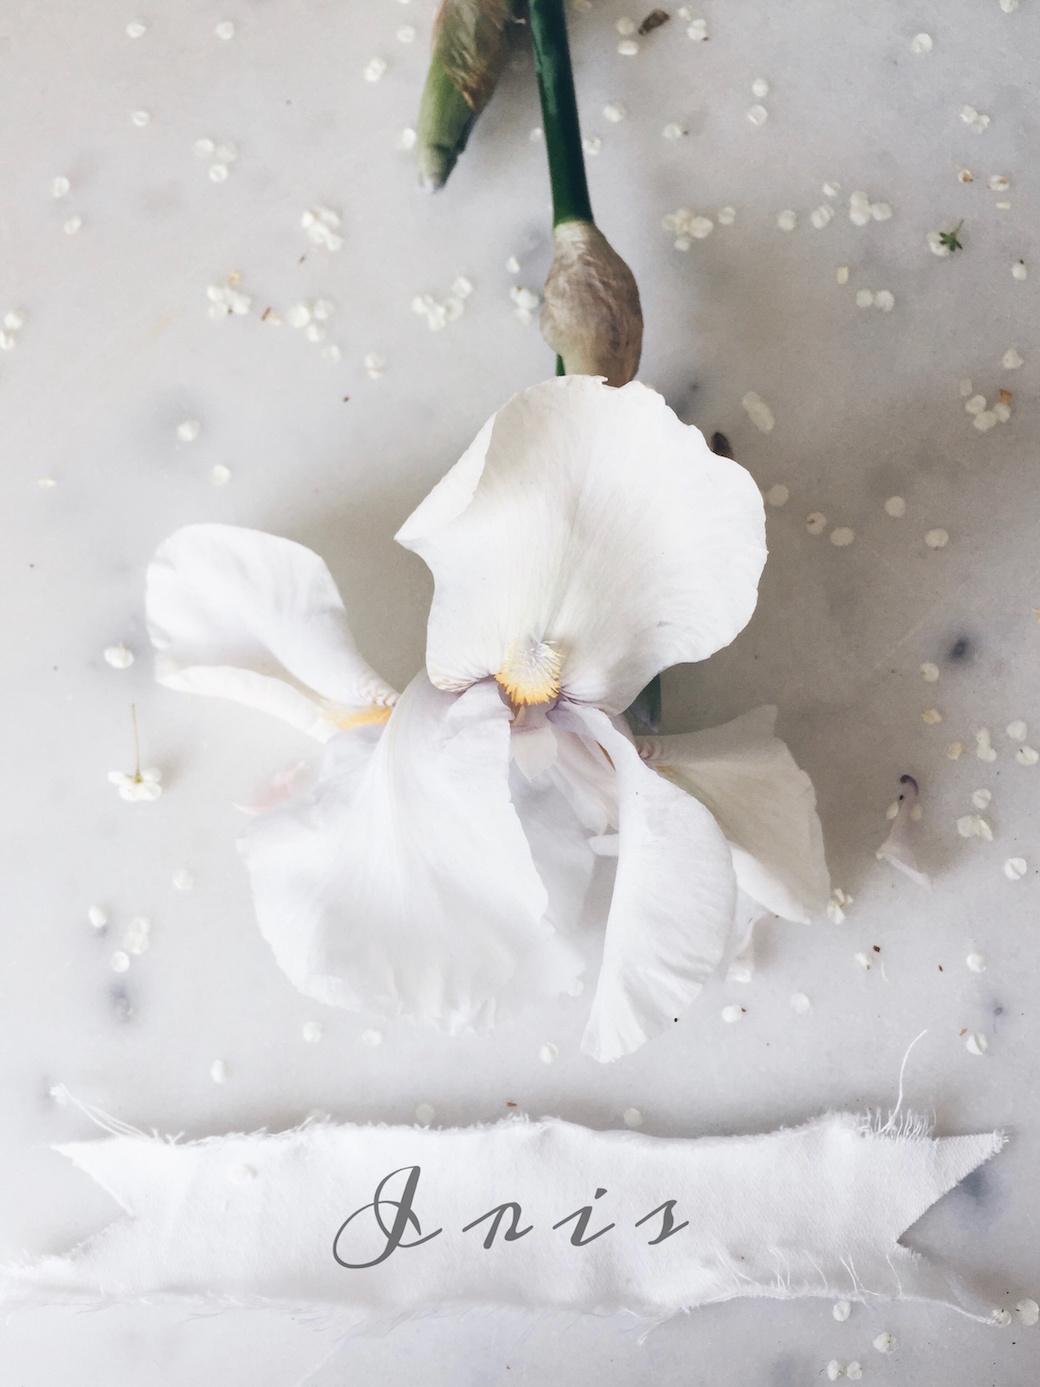 iris floral photography / stylist Anastasia Benko